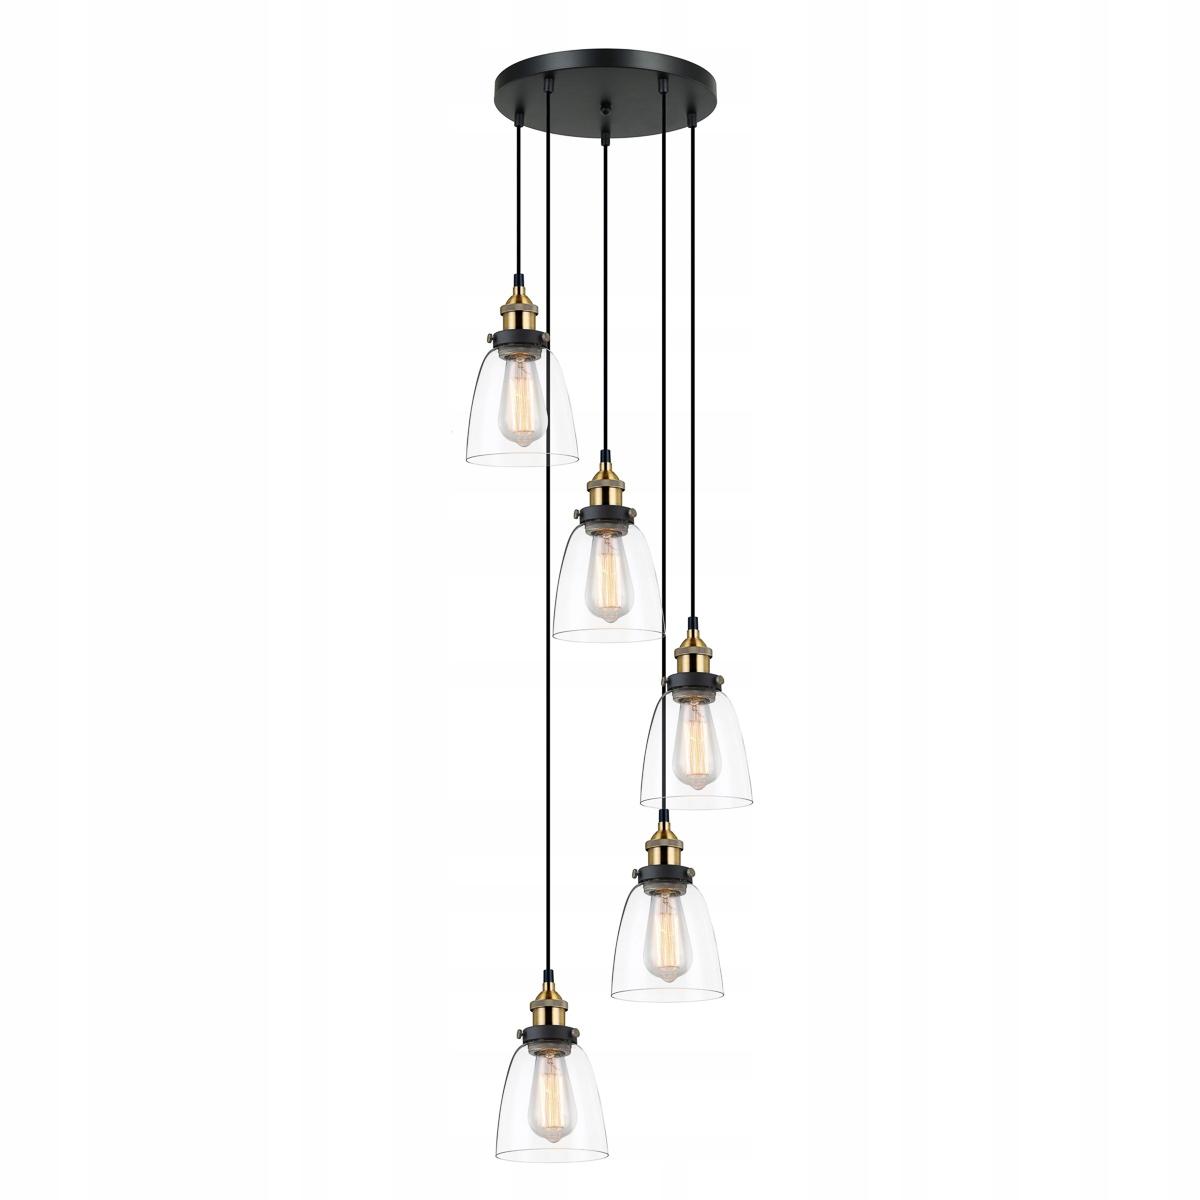 LAMPA PREVIS RETRO FRANCIS MDM-2563/5GD+CL ITALUX